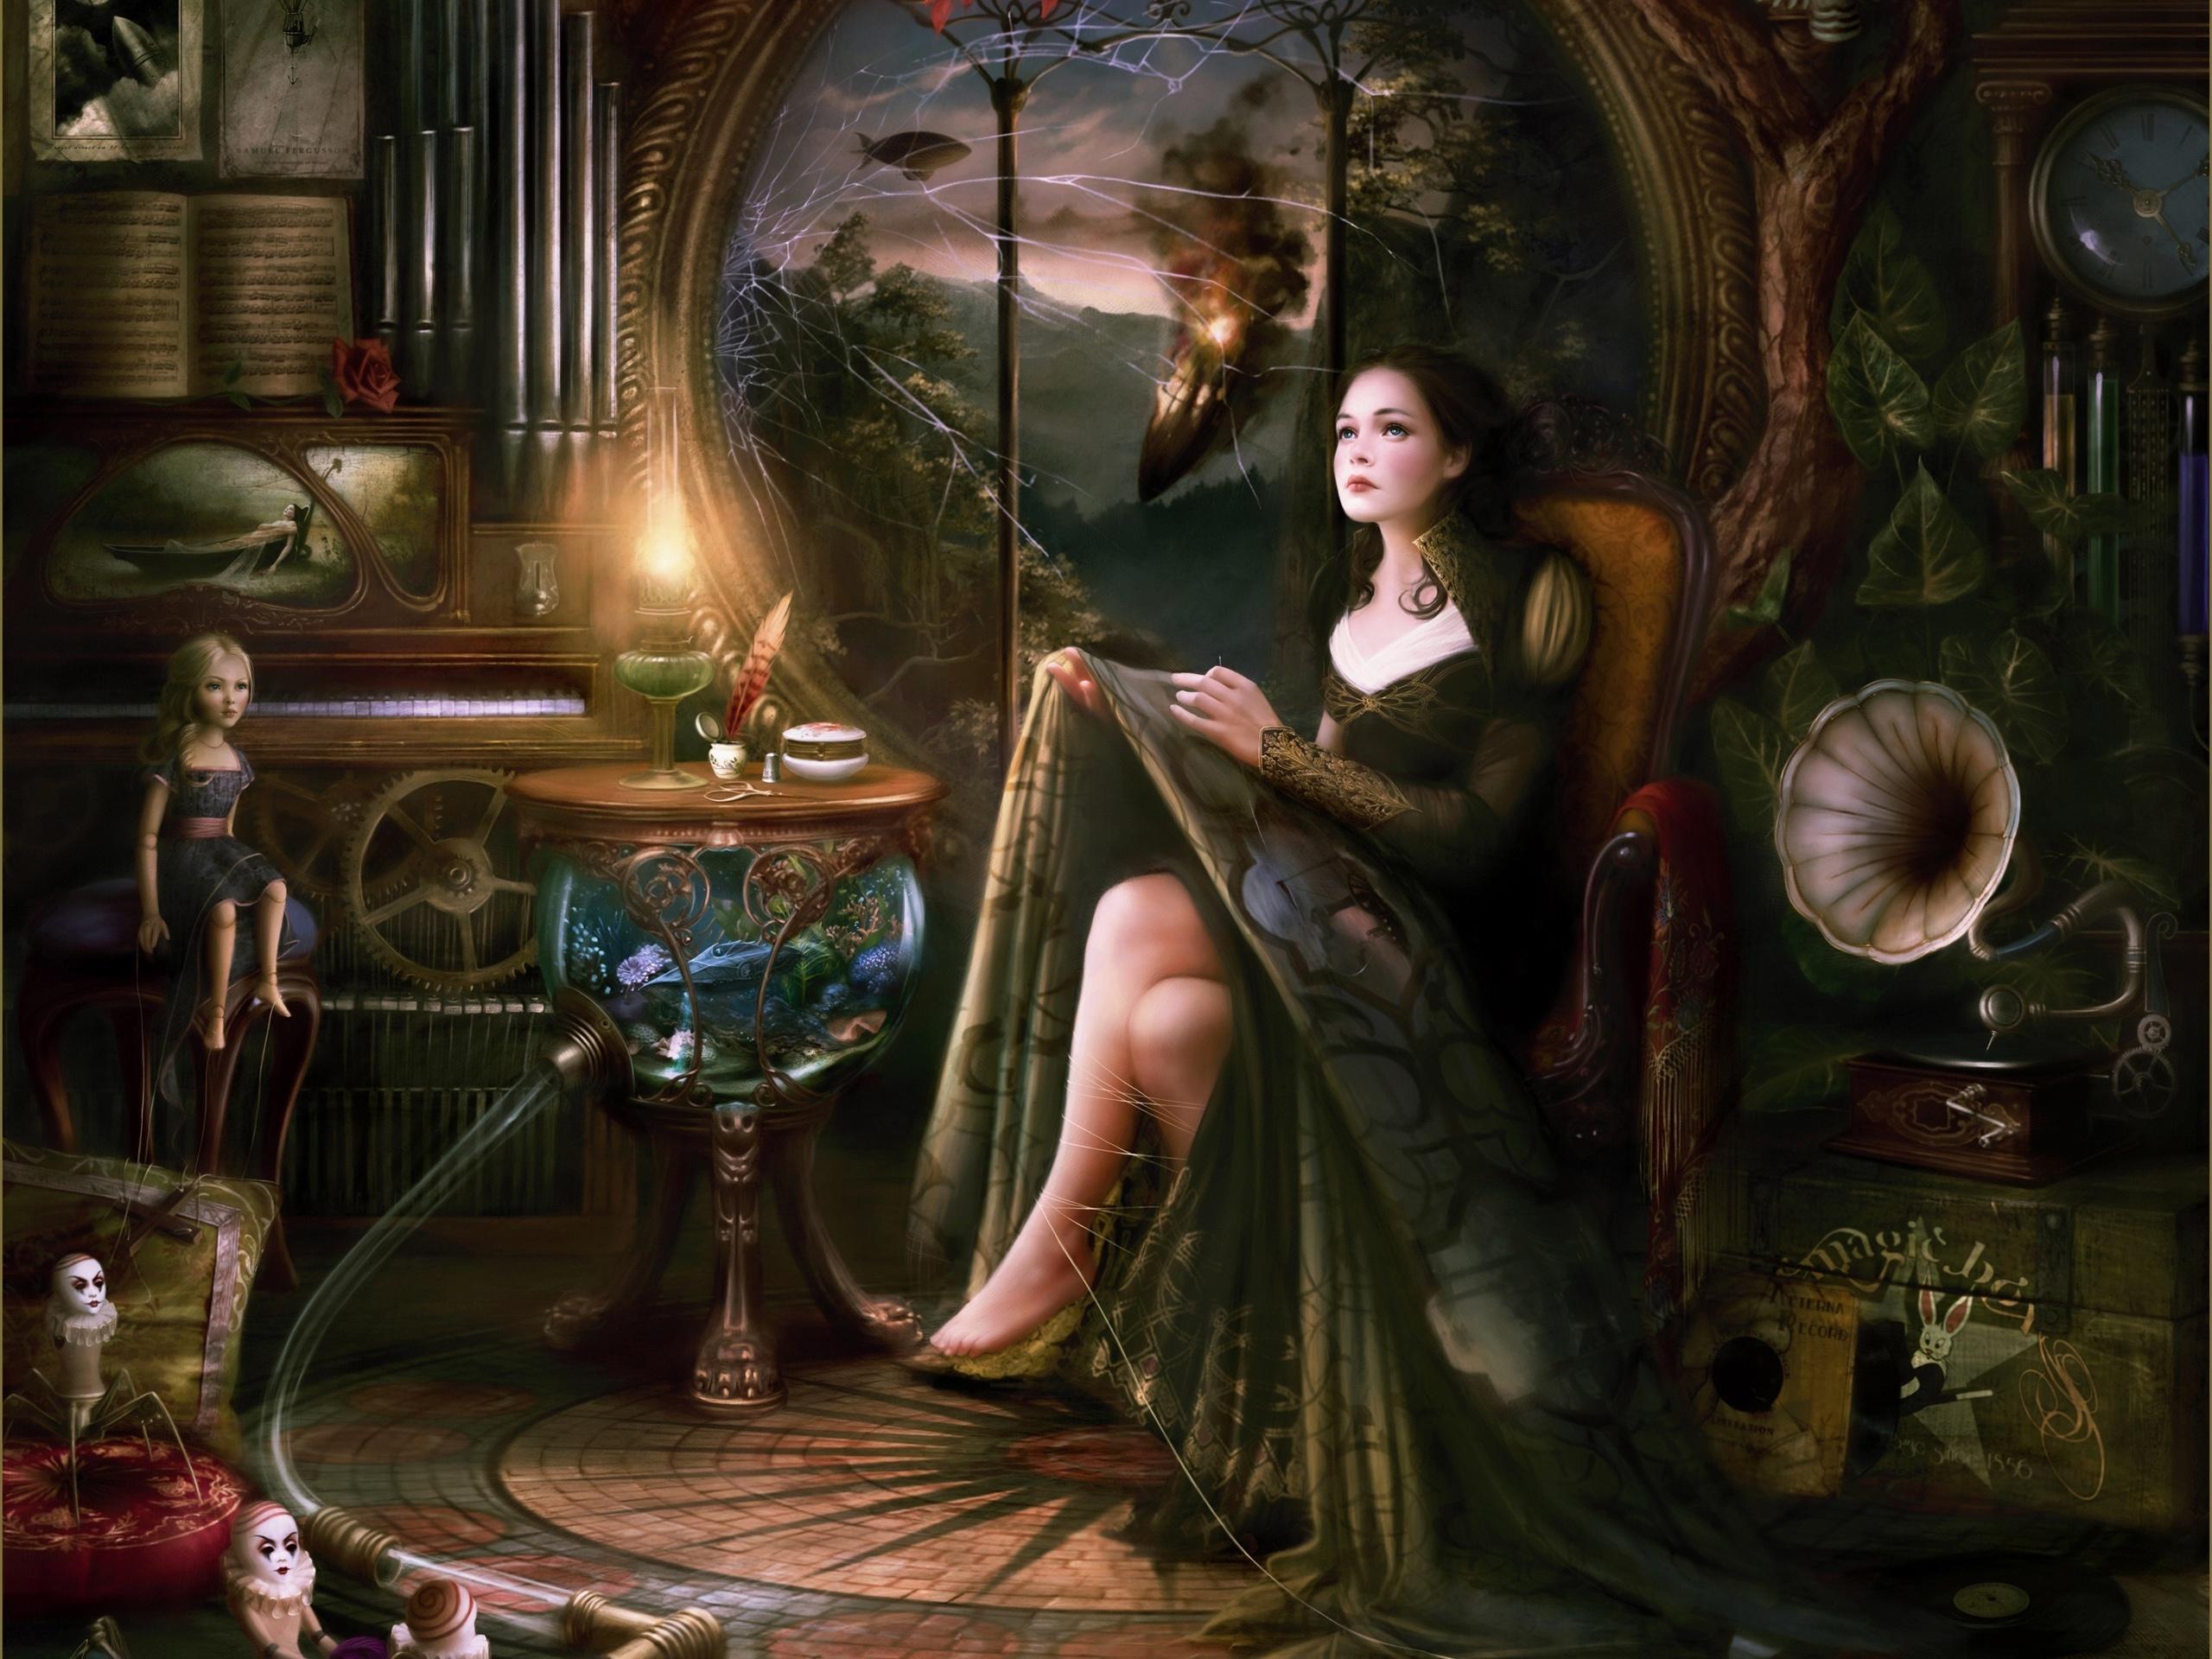 wallpaper beautiful girl of the fairy tale world 2560x1920 hd